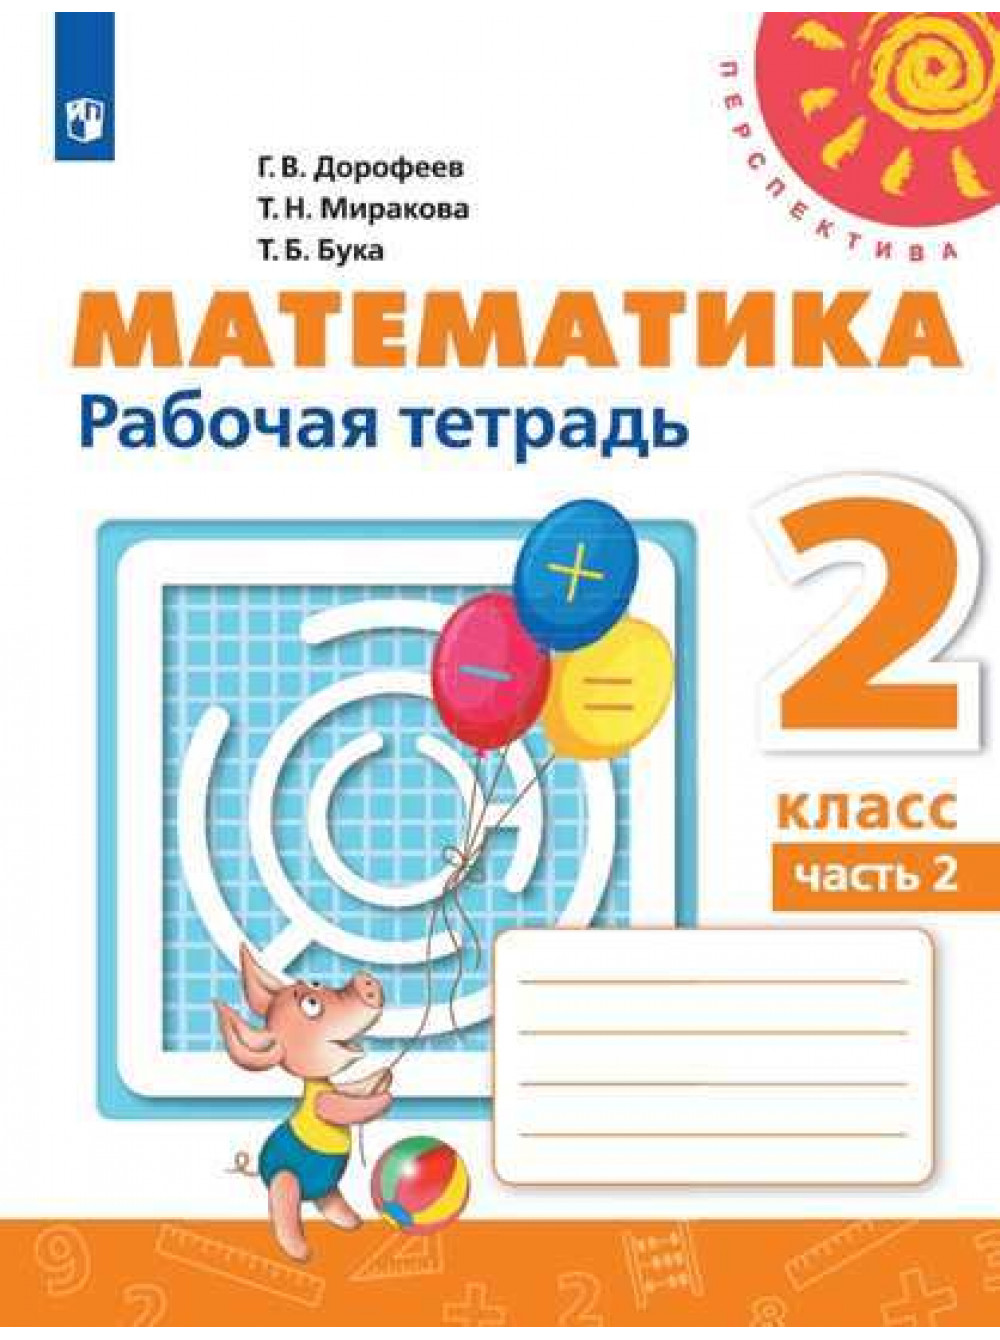 Дорофеев, Математика, Рабочая тетрадь, 2 класс В 2-Х Ч.Ч, 1 перспектива